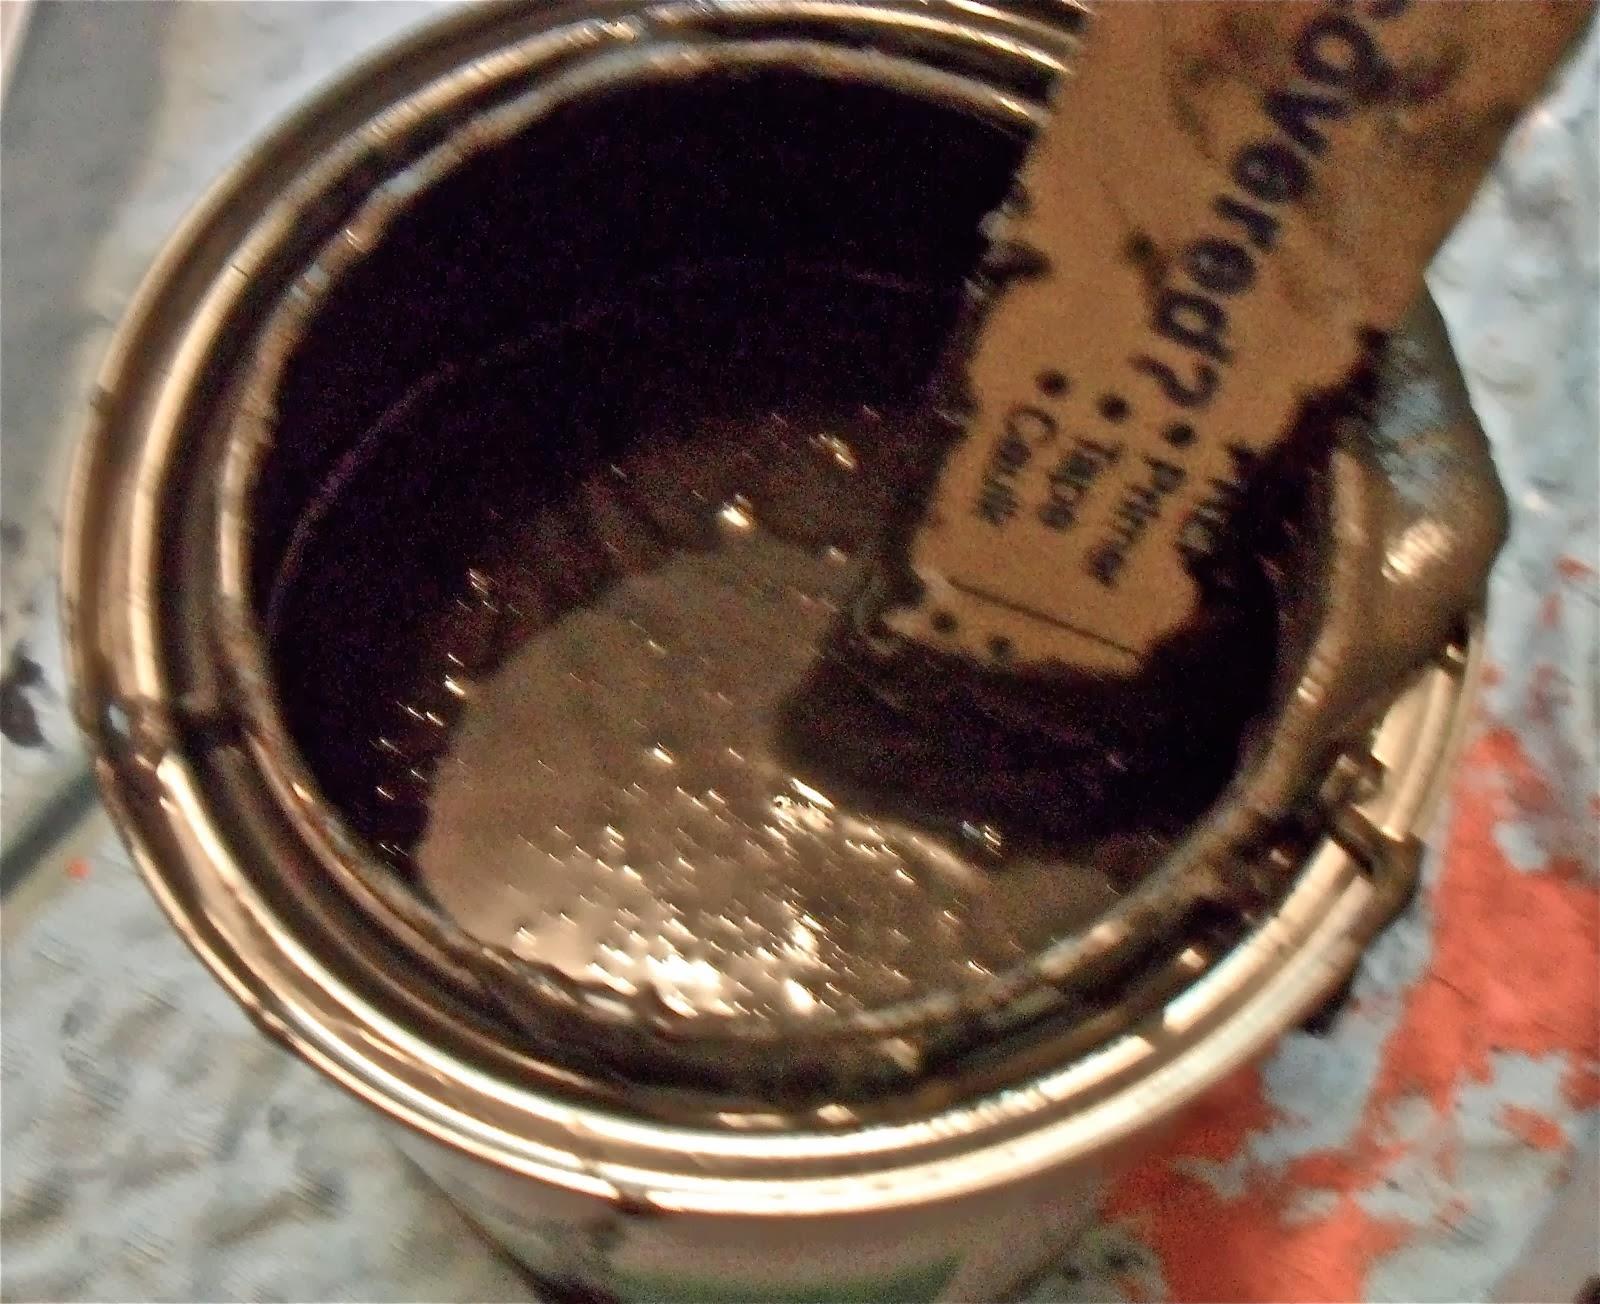 La vernice magnetica e la pittura lavagna strane idee for Idee strane